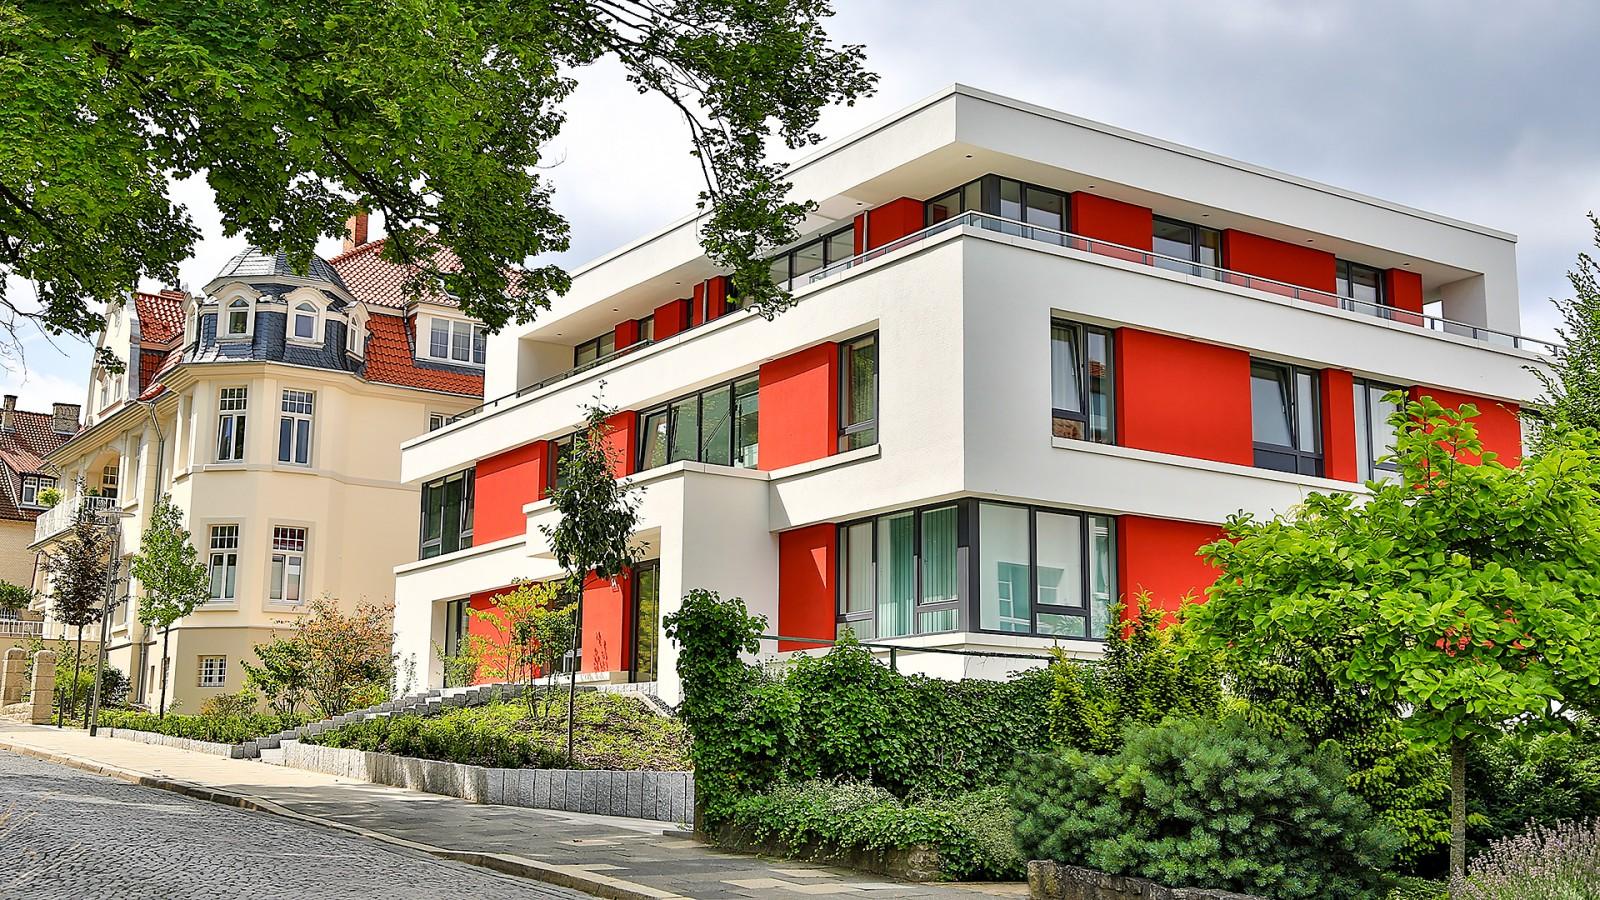 Neubau mehrfamilienhaus in hildesheim jung for Mehrfamilienhaus neubau